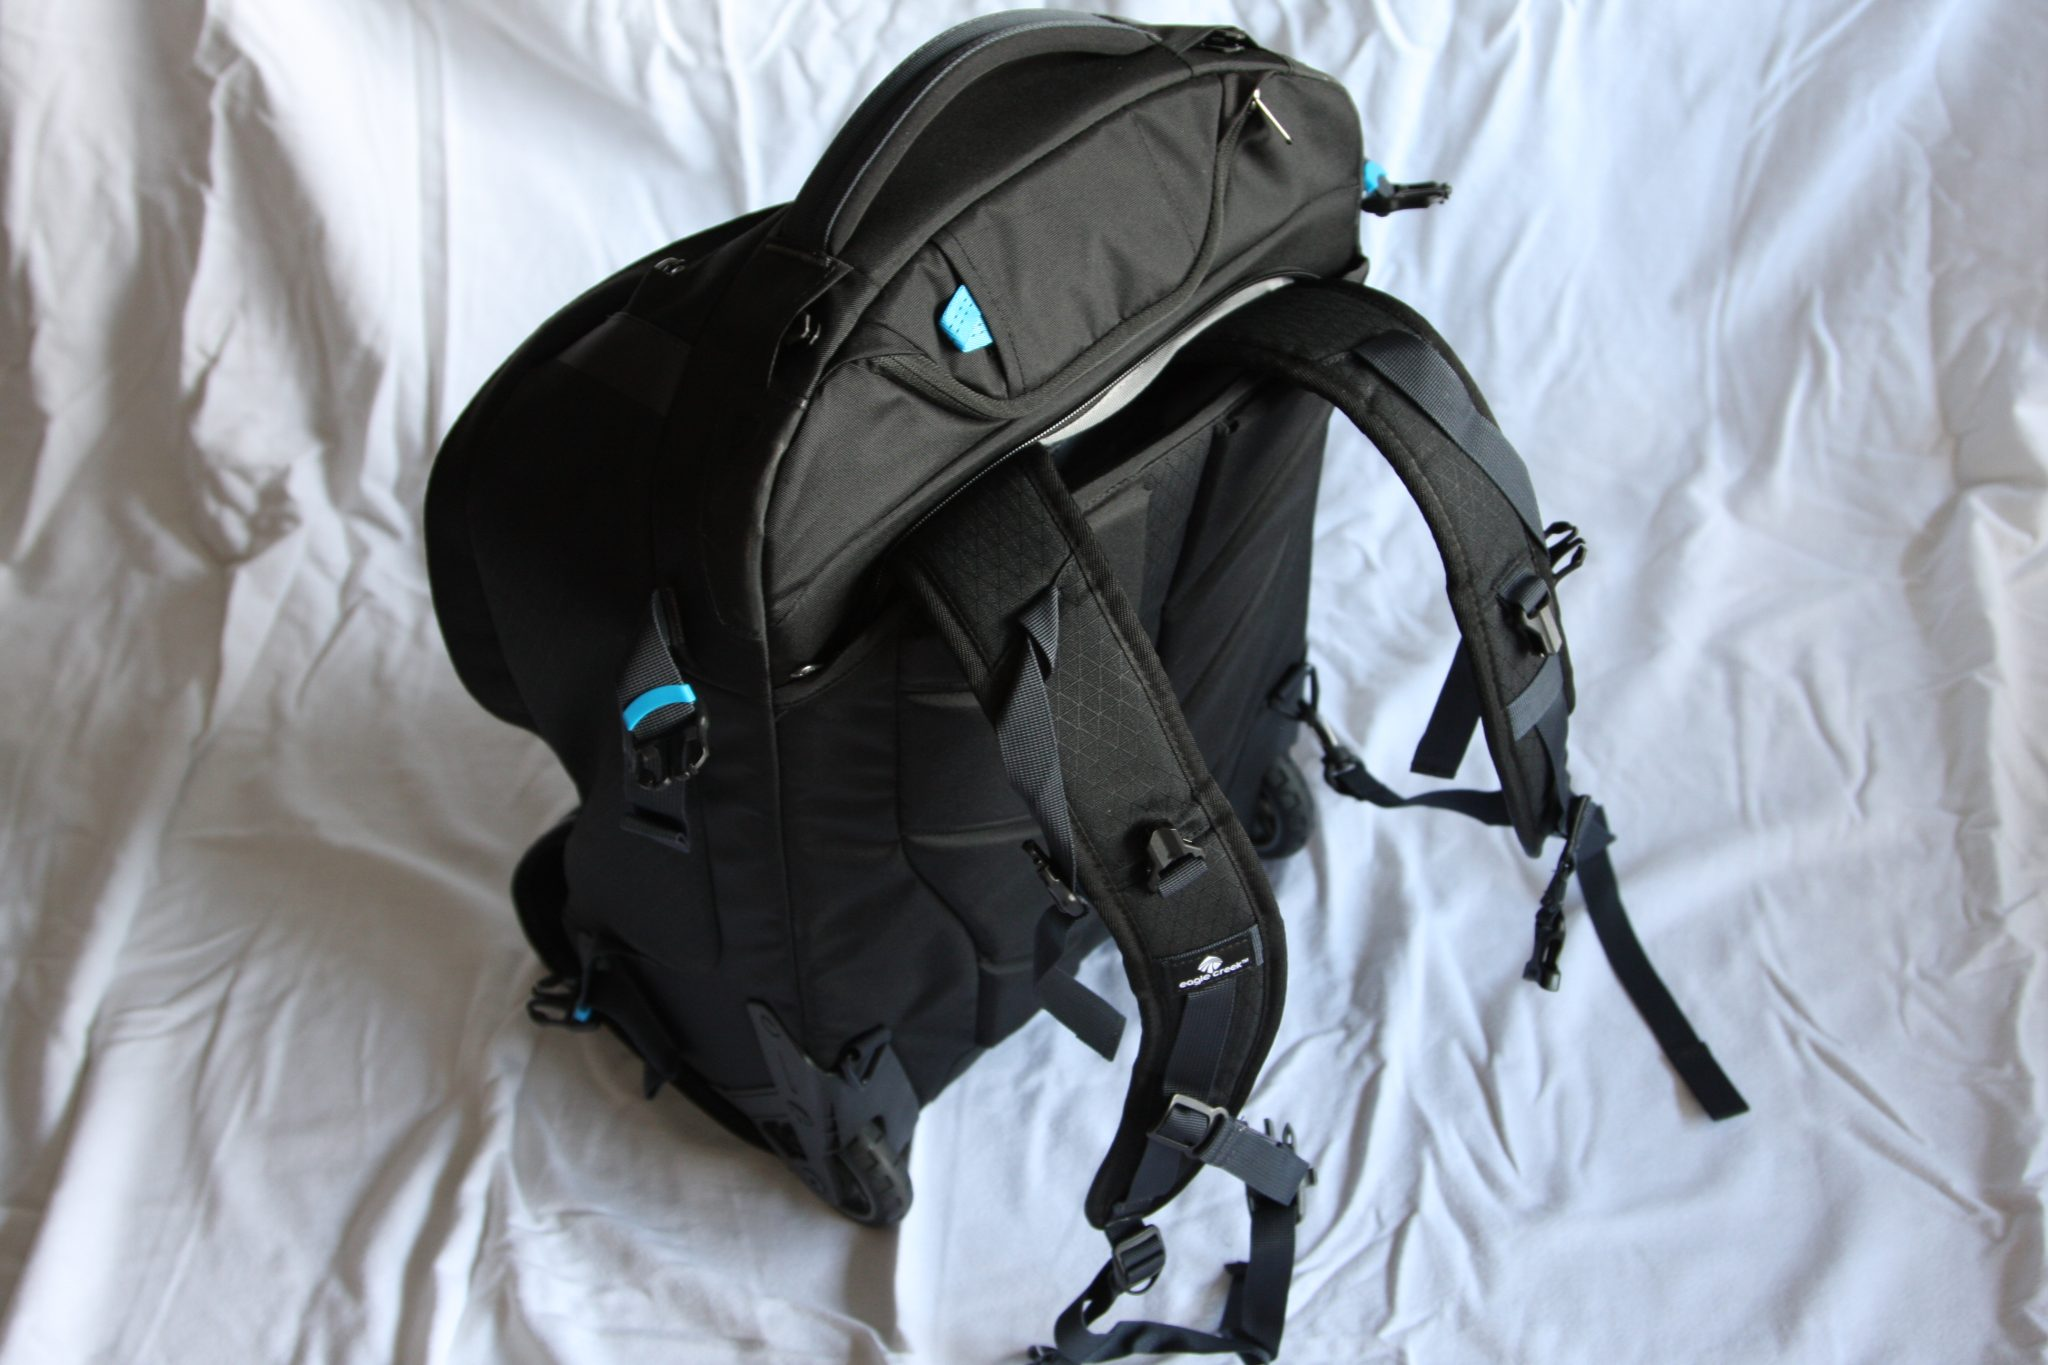 Eagle Creek Doubleback Wheeled Backpack straps